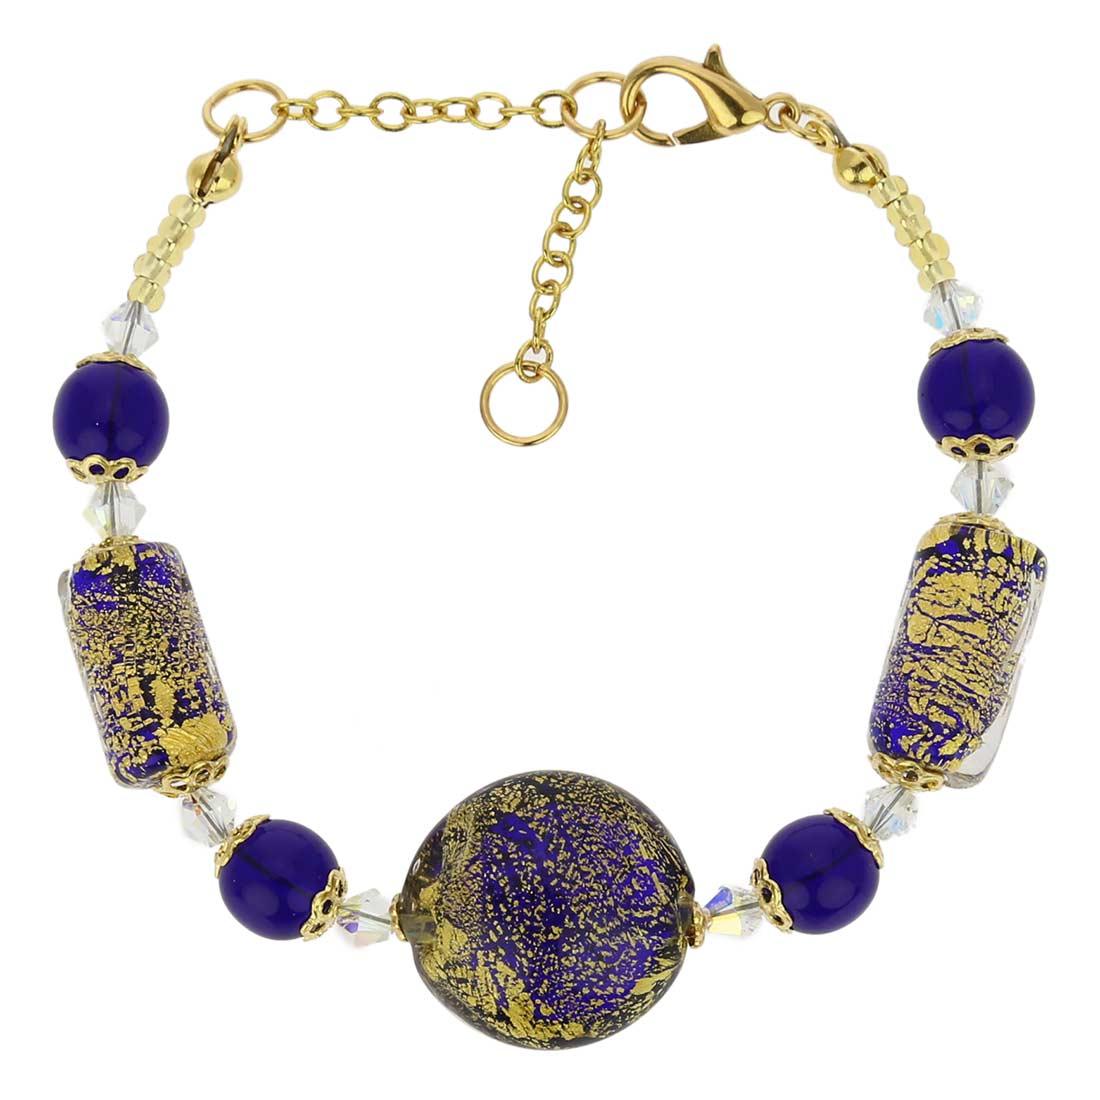 Ca D'Oro Murano Bracelet - Cobalt Blue